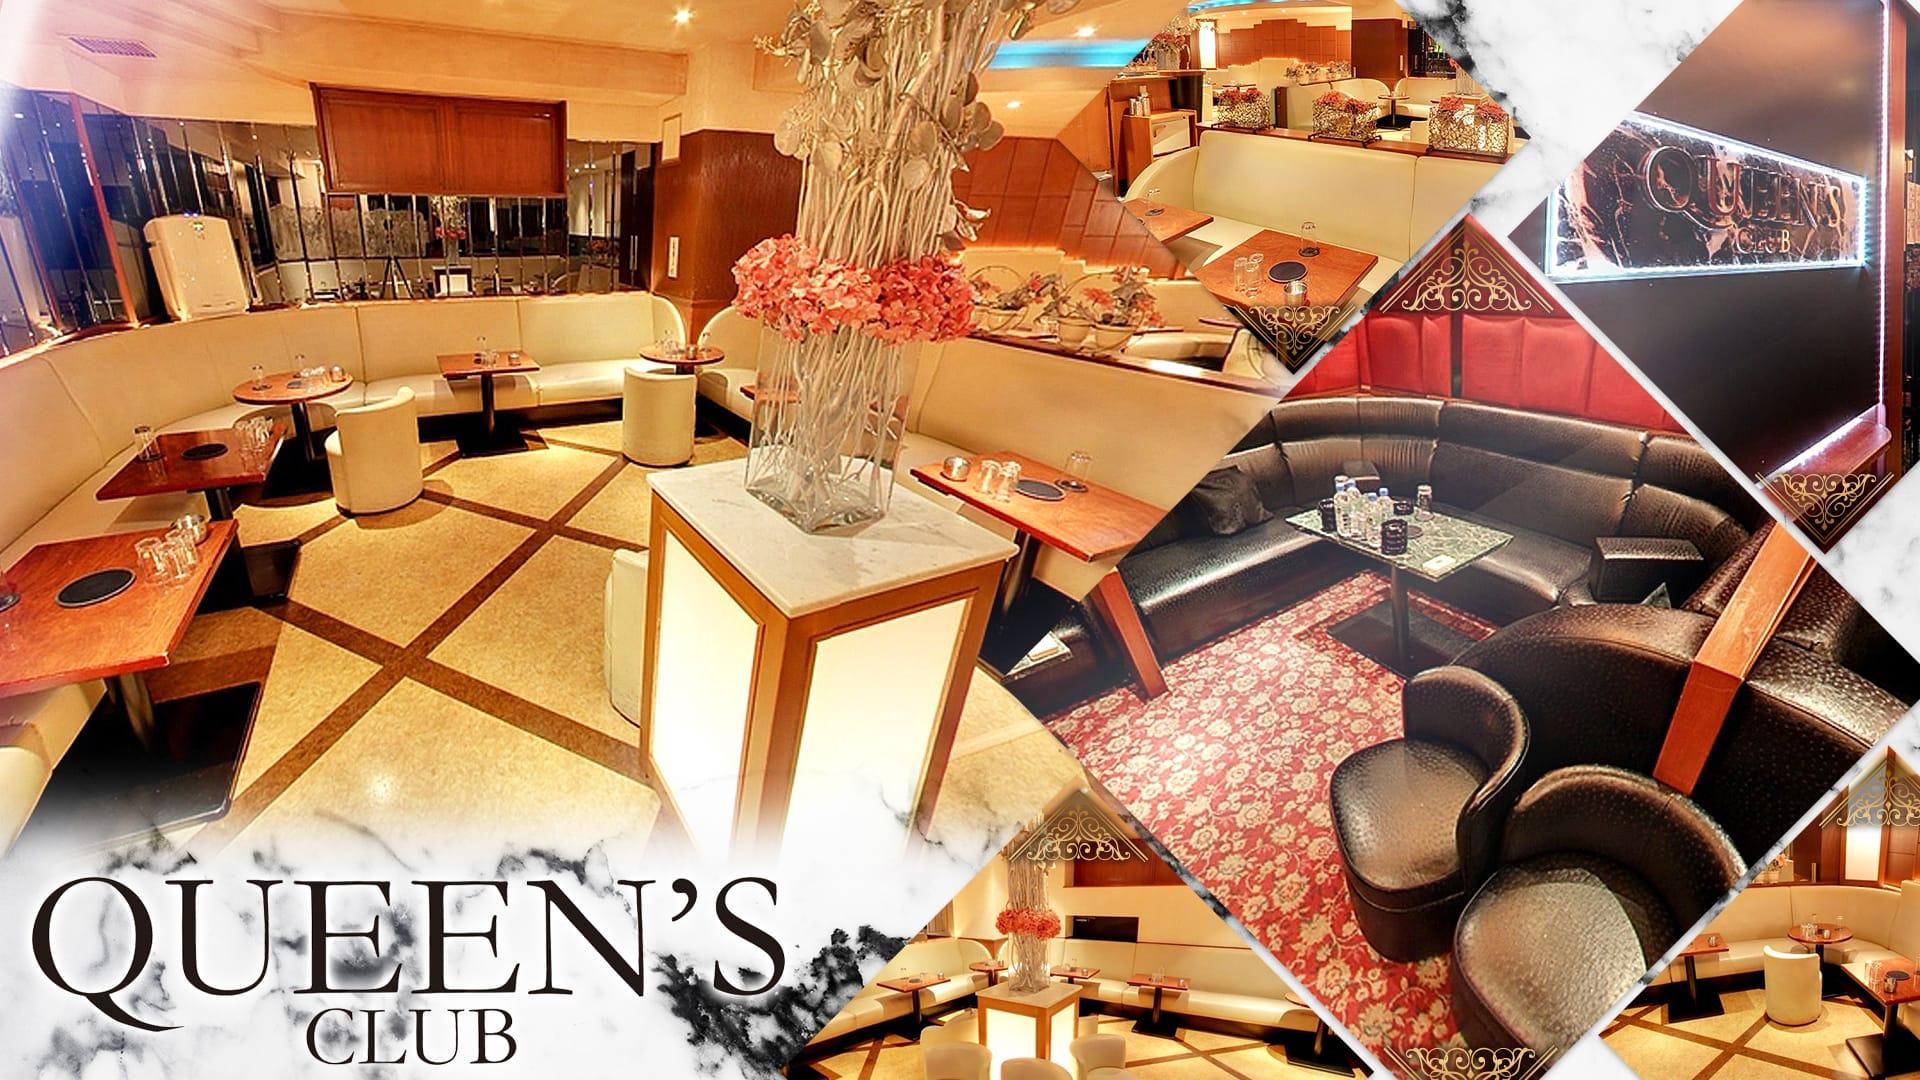 QUEEN'S CLUB[クイーンズクラブ] 上野 キャバクラ TOP画像